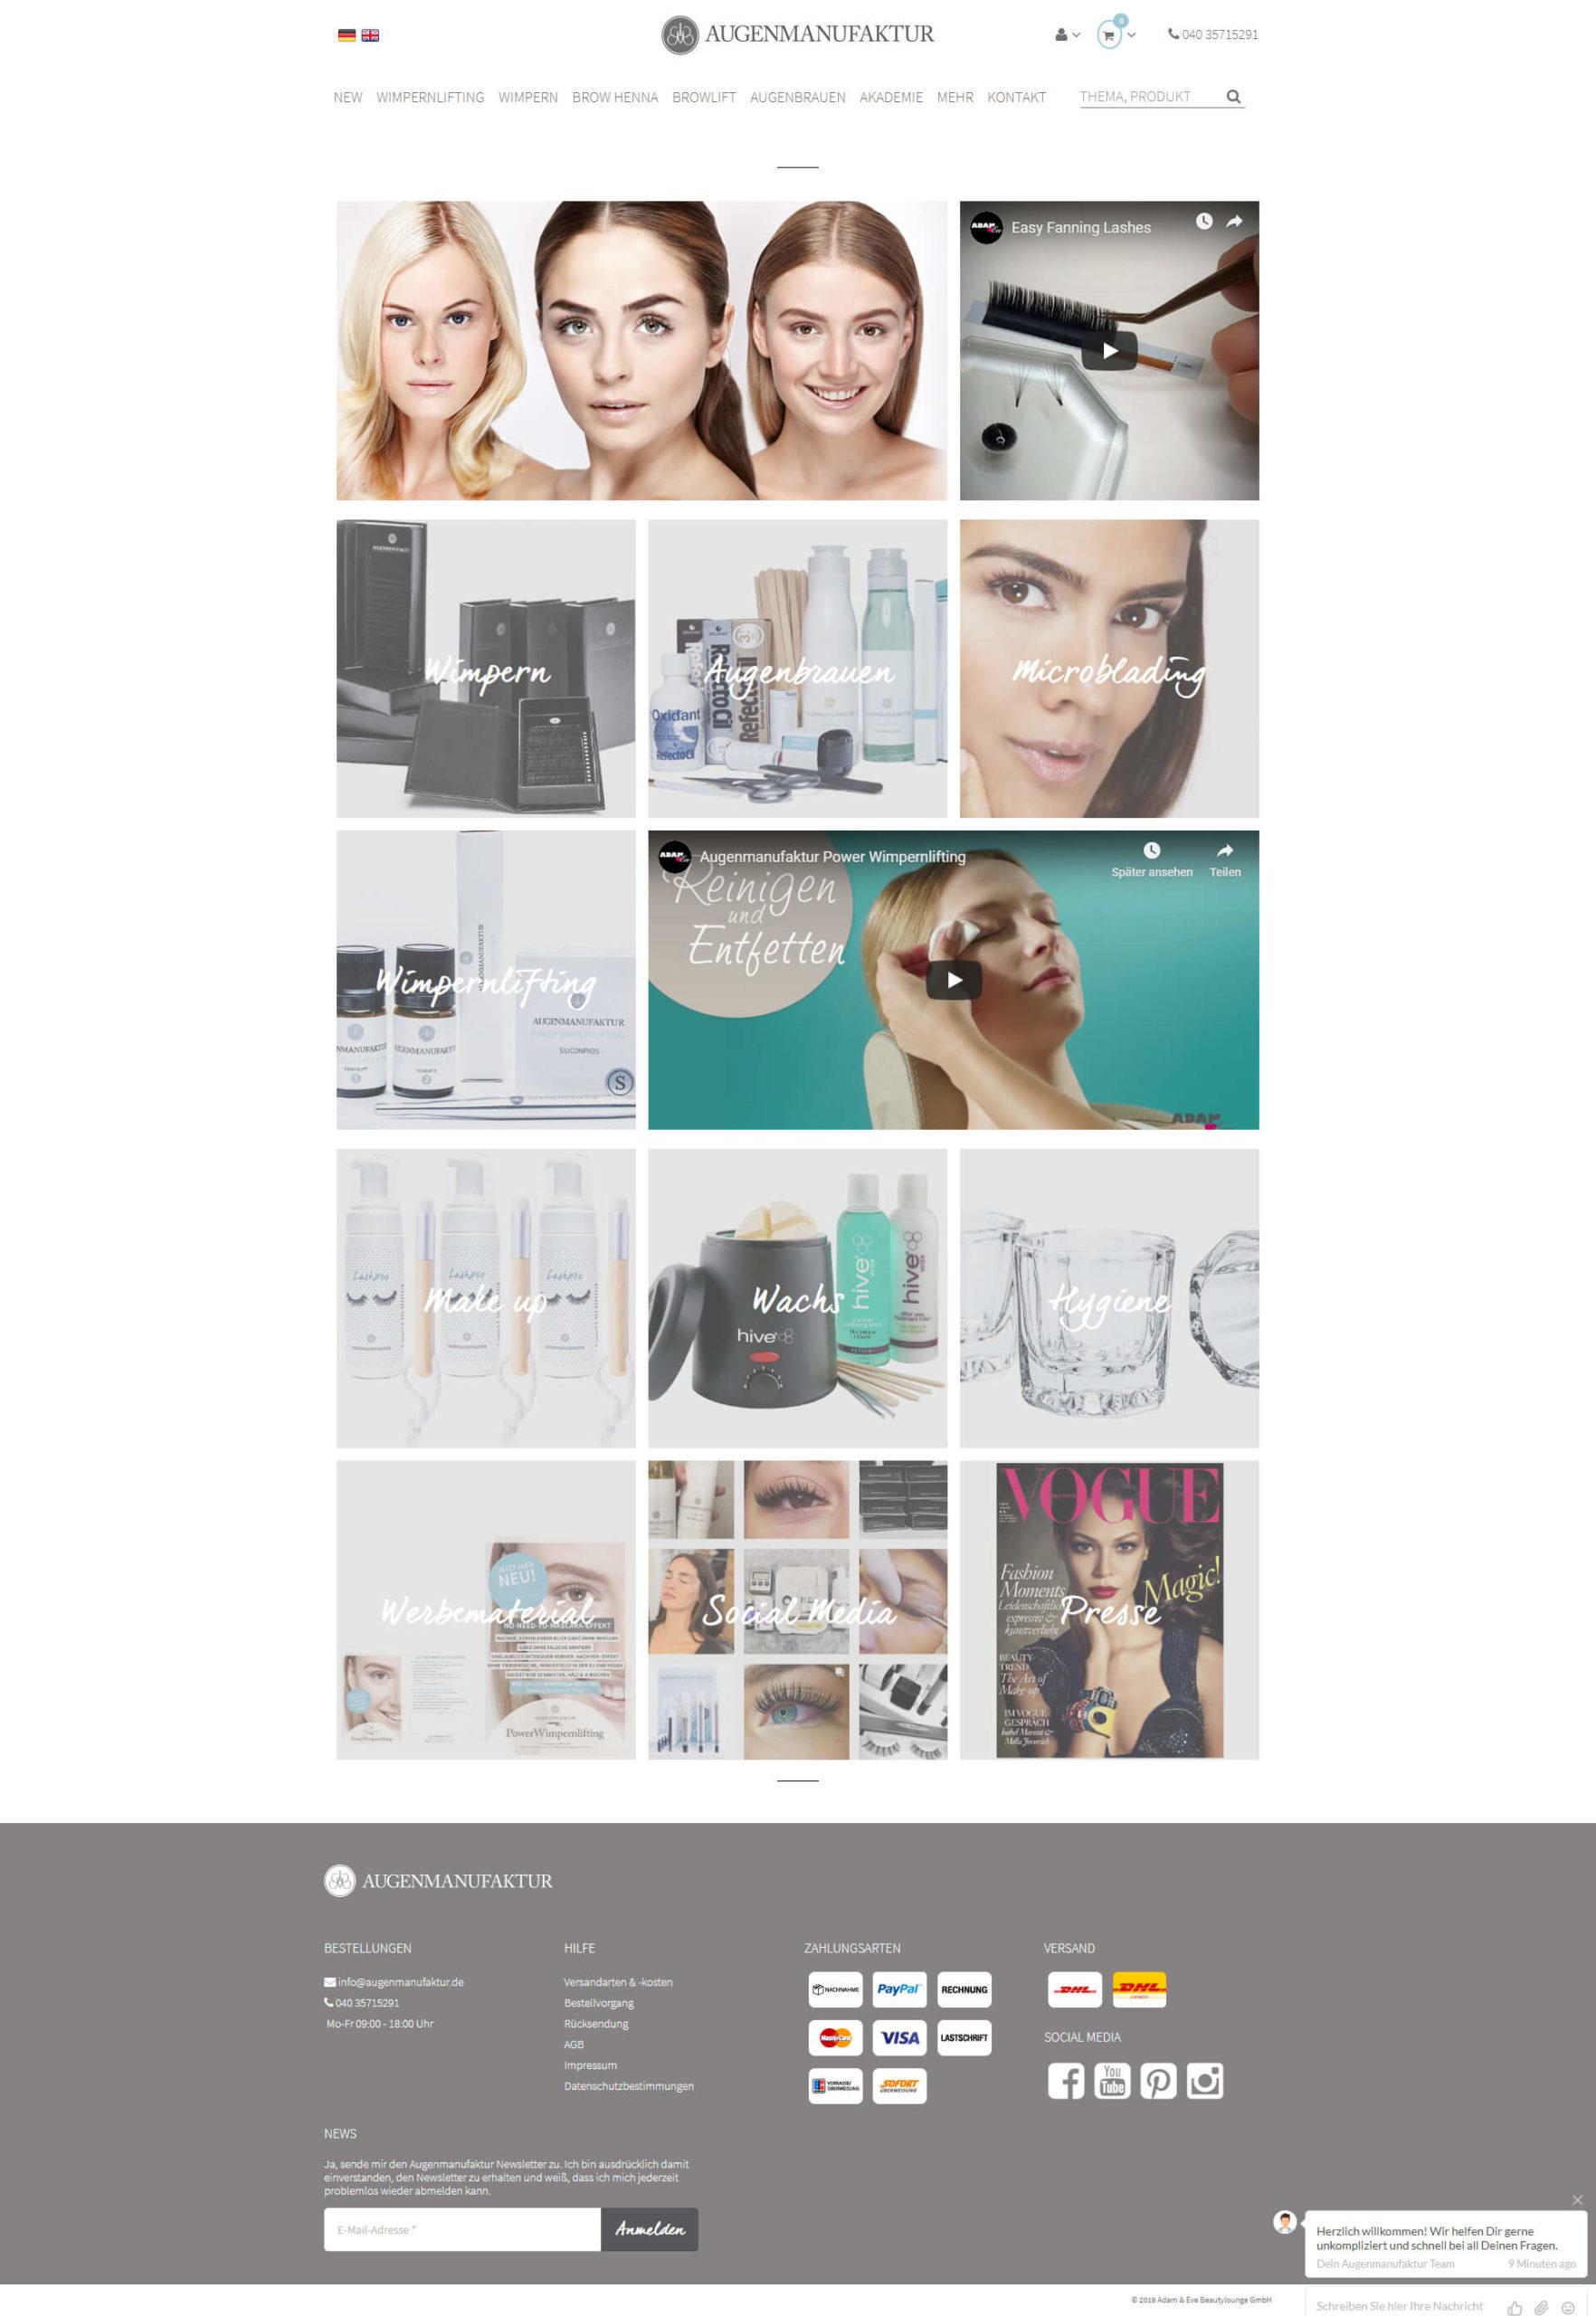 Web-Wikinger-Projektbild-Augenmanufaktur-de